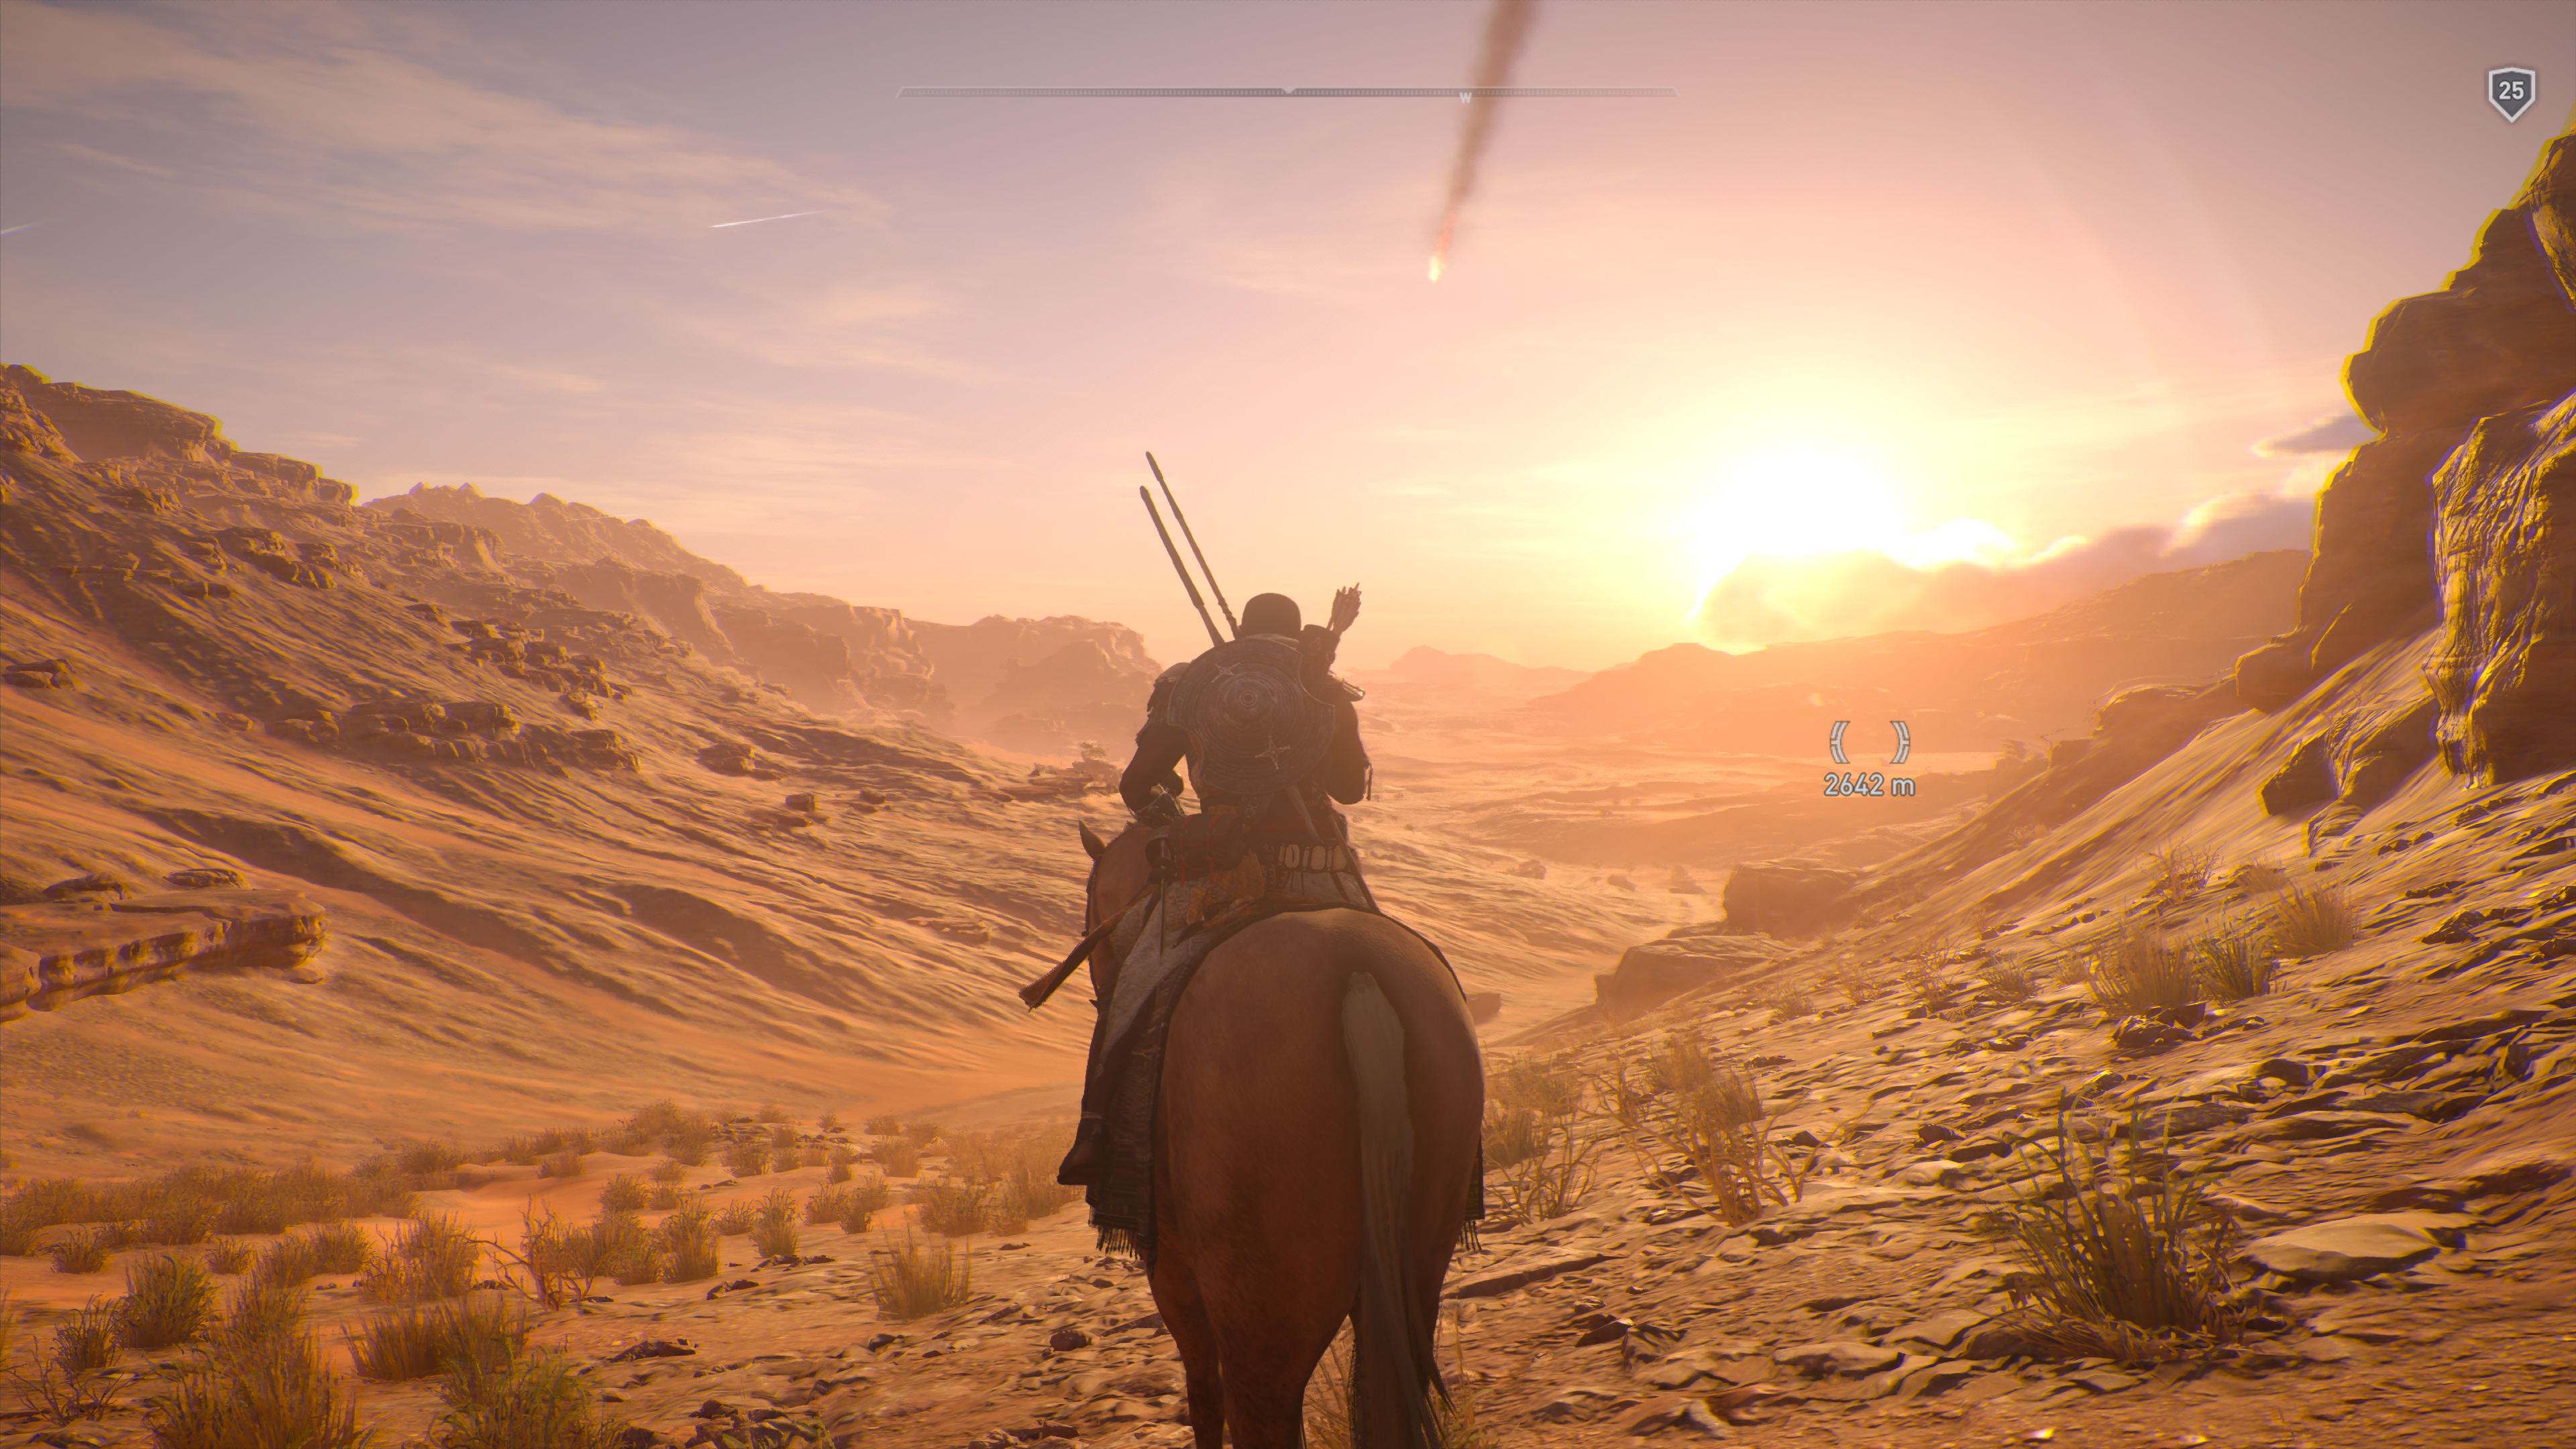 Top Wallpaper Horse Assassin'S Creed - asscreedorigins  Collection_397437.png